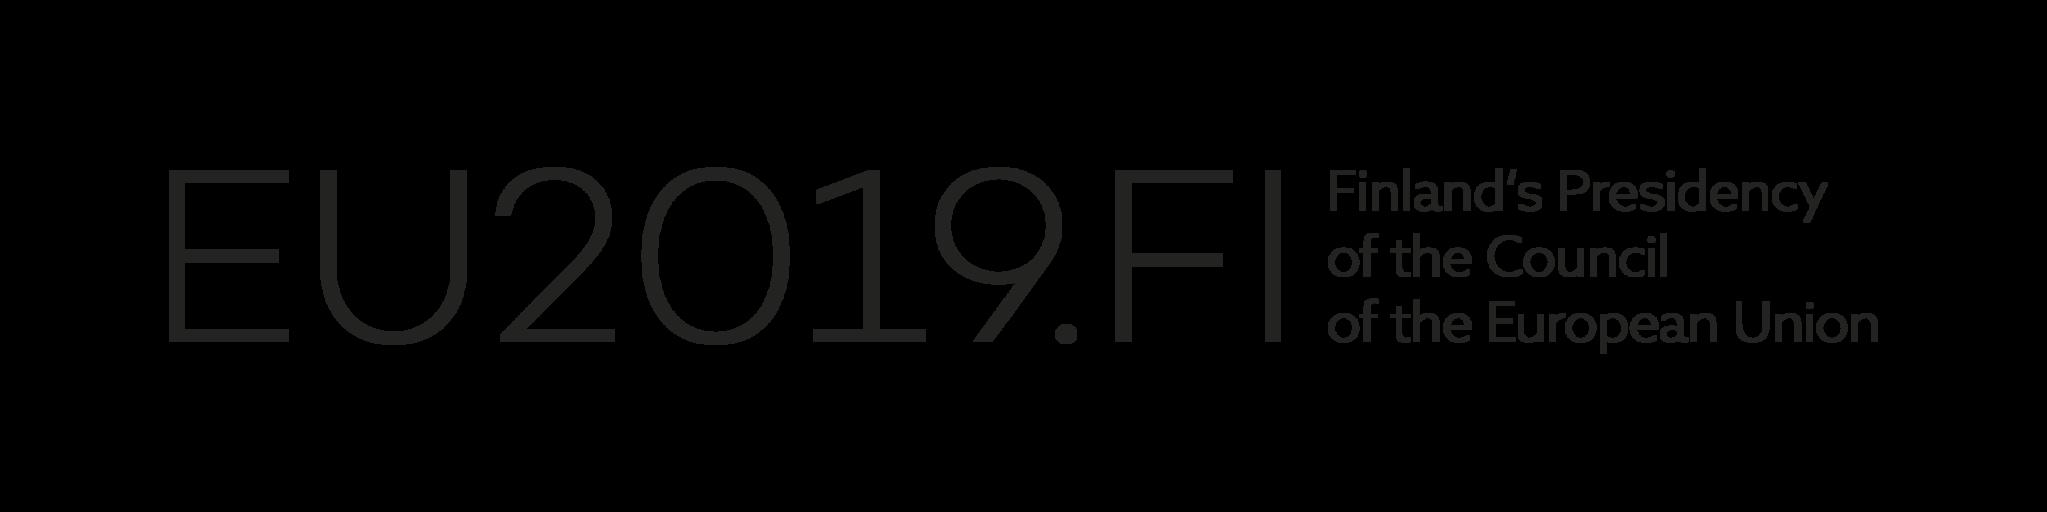 EUFI-logo_en_musta